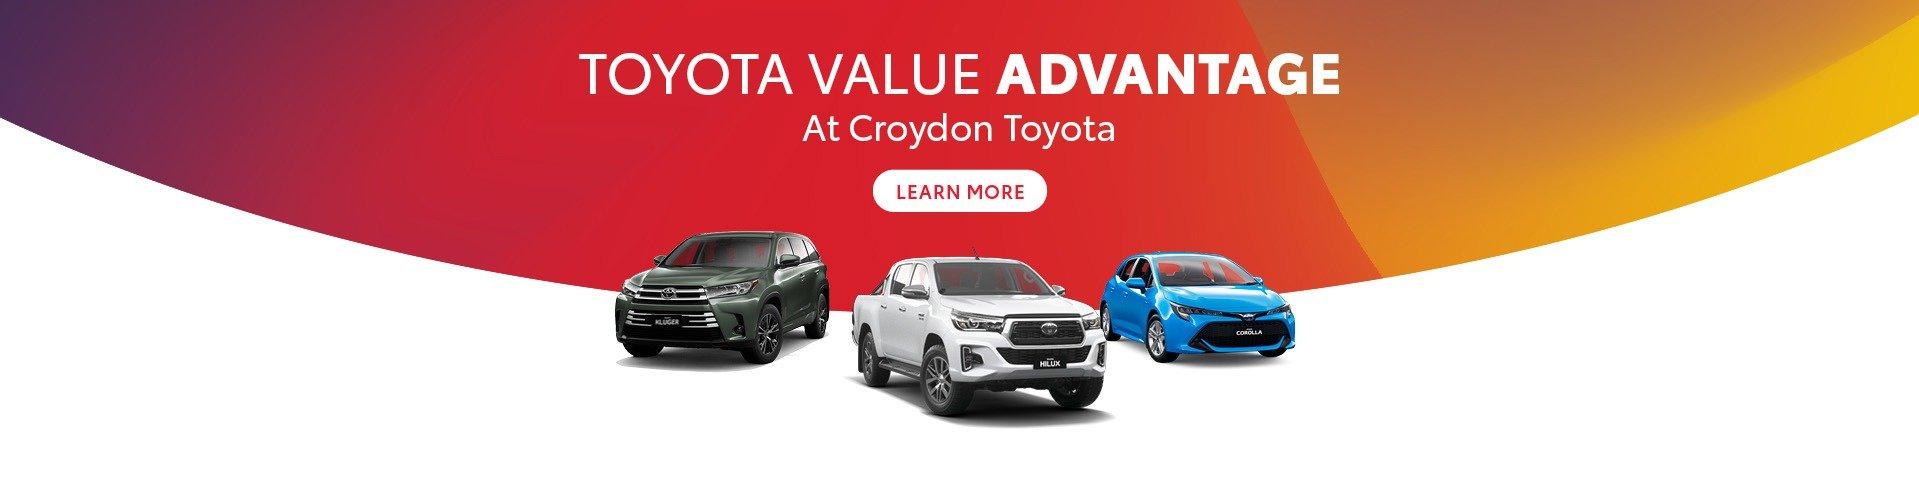 Croydon Toyota - Total Value Advantage